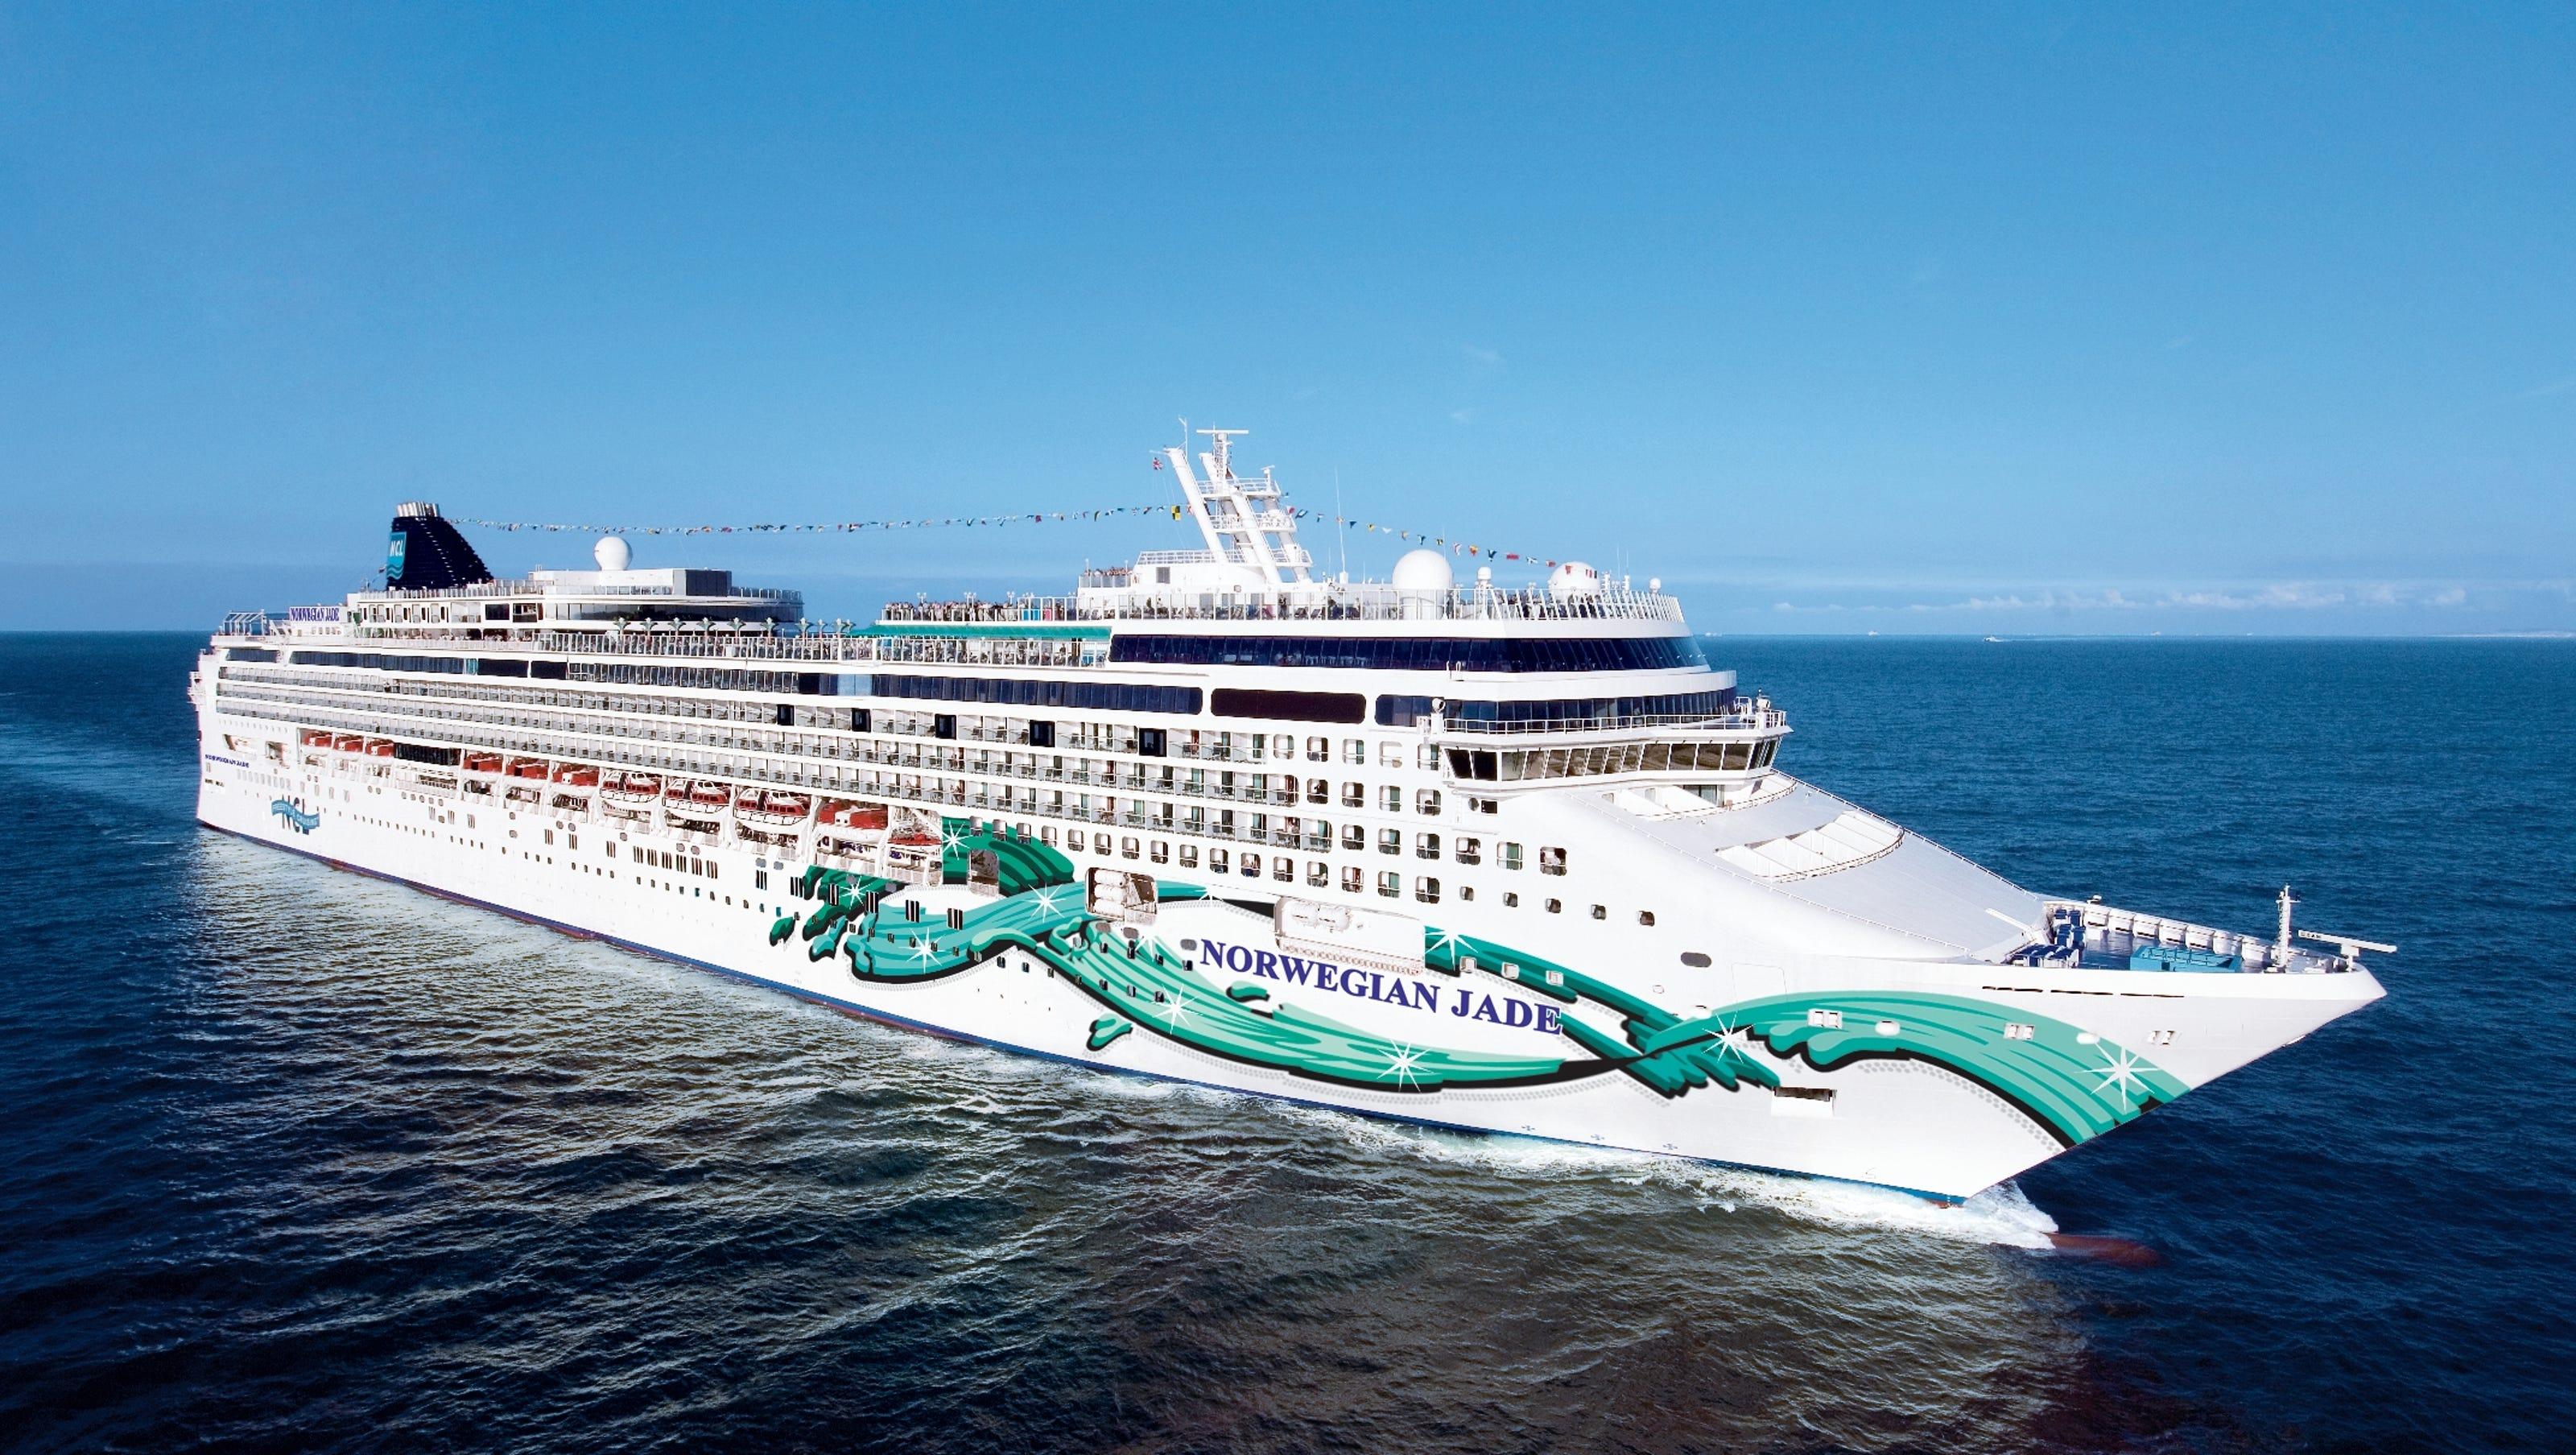 Norwegian Jade Cruise Ship Experiences Mechanical Trouble